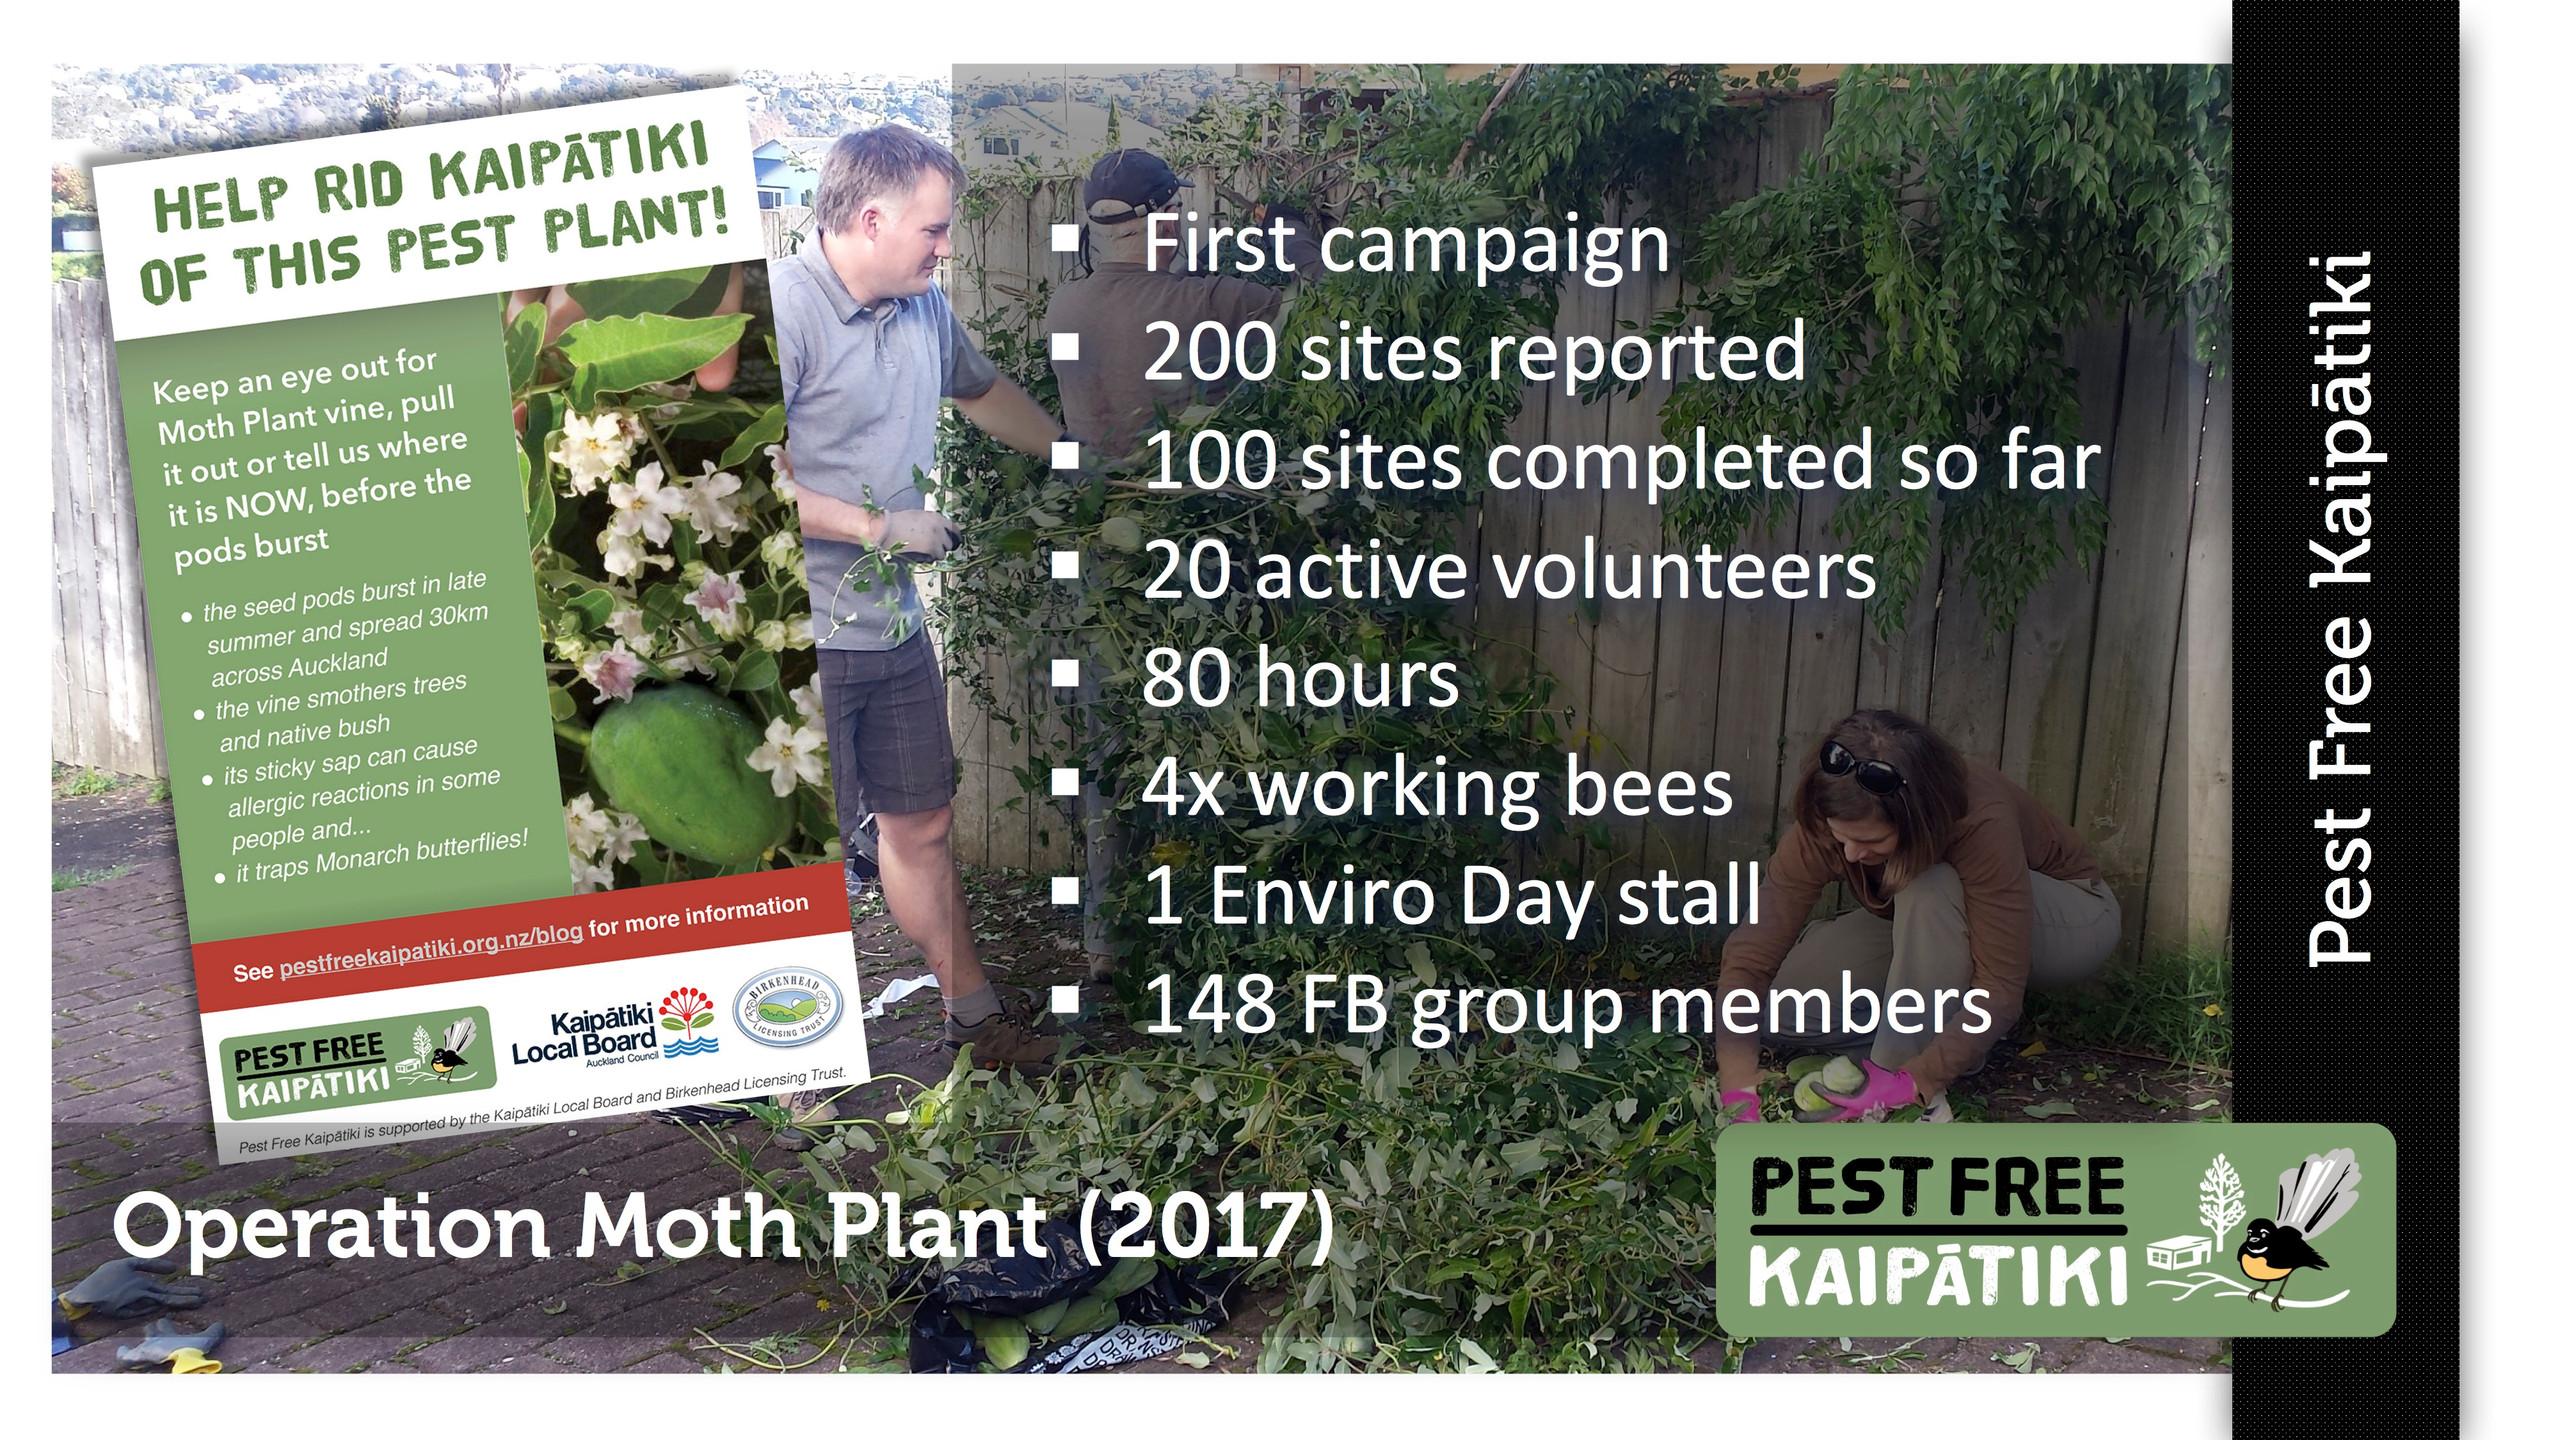 Pest Free Kaipatiki-Pestival-slide14